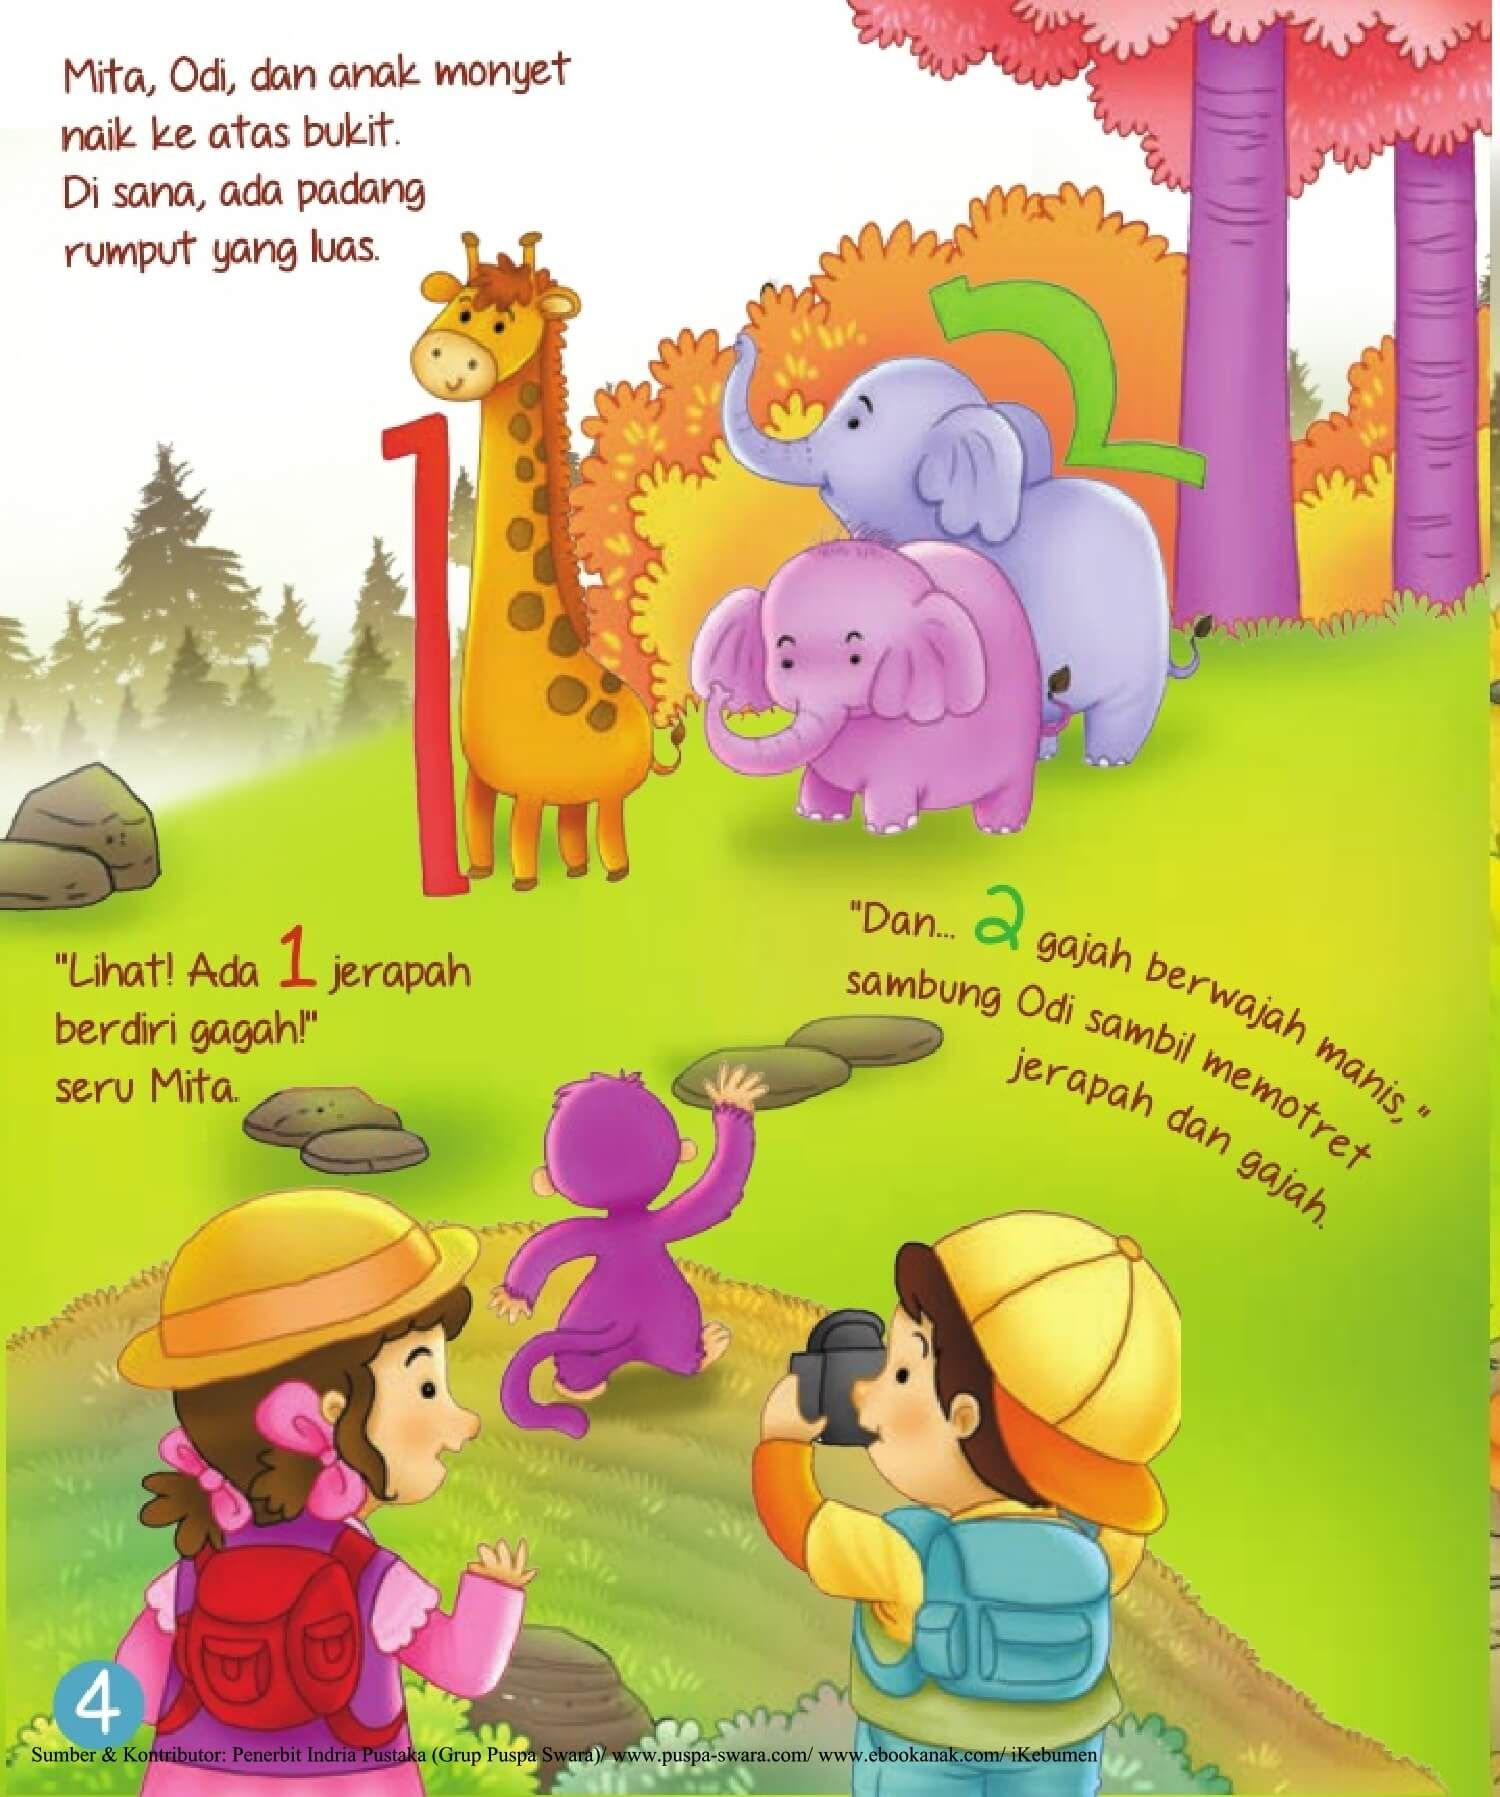 Ebook 2 In 1 Dongeng Dan Aktivitas Bukit Angka Jerapah Dan Gajah 6 Ebook Anak Anak Jerapah Buku Bayi